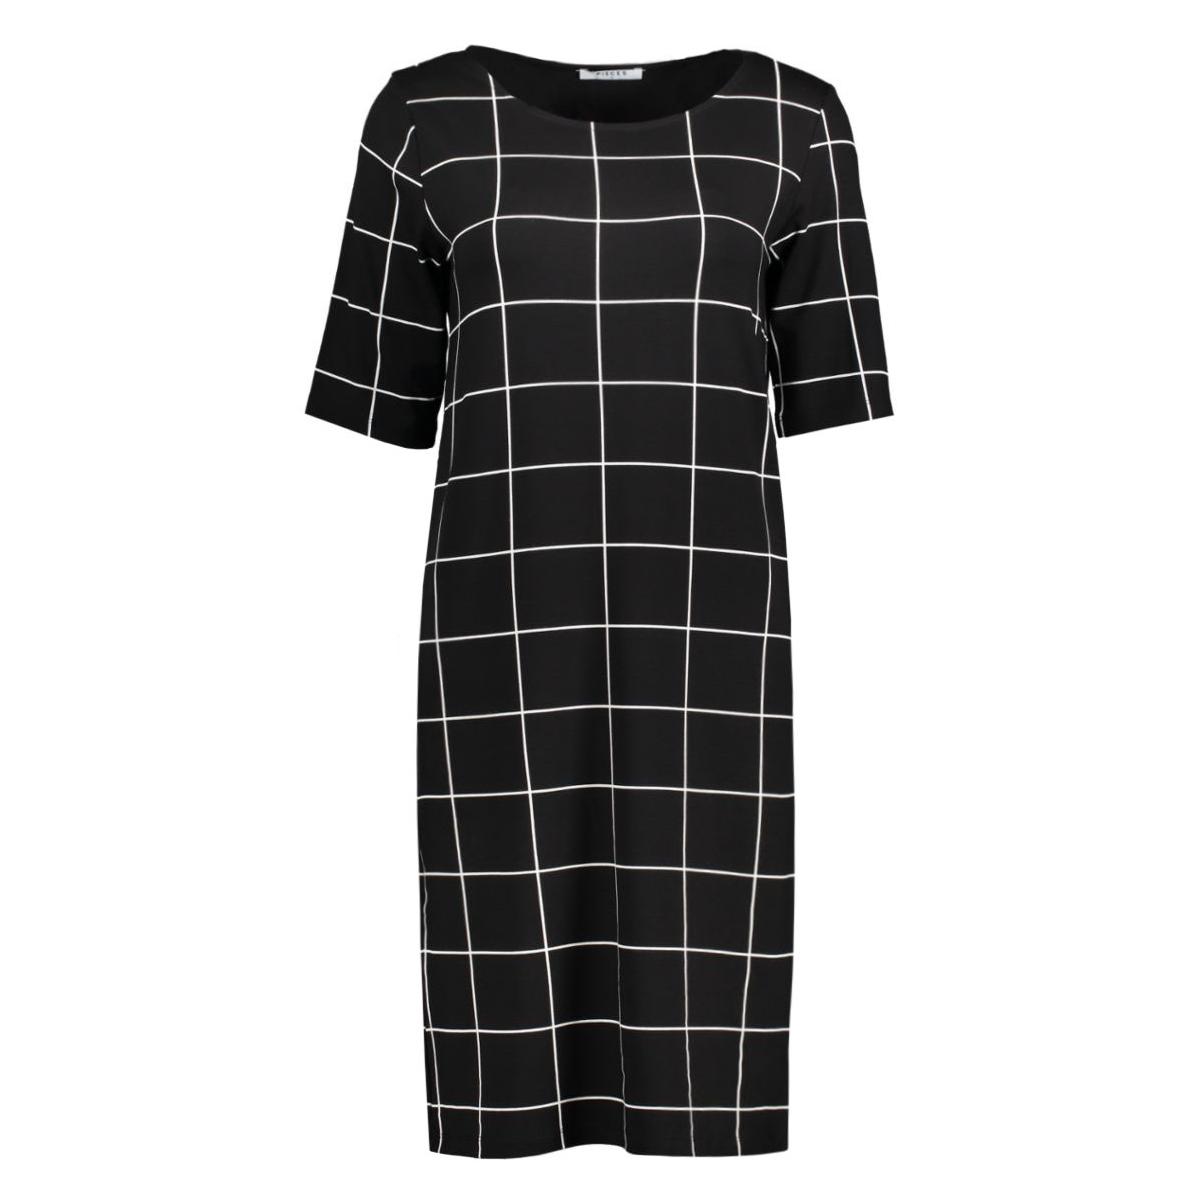 pcdamara  2/4 dress box 17079801 pieces jurk black/white